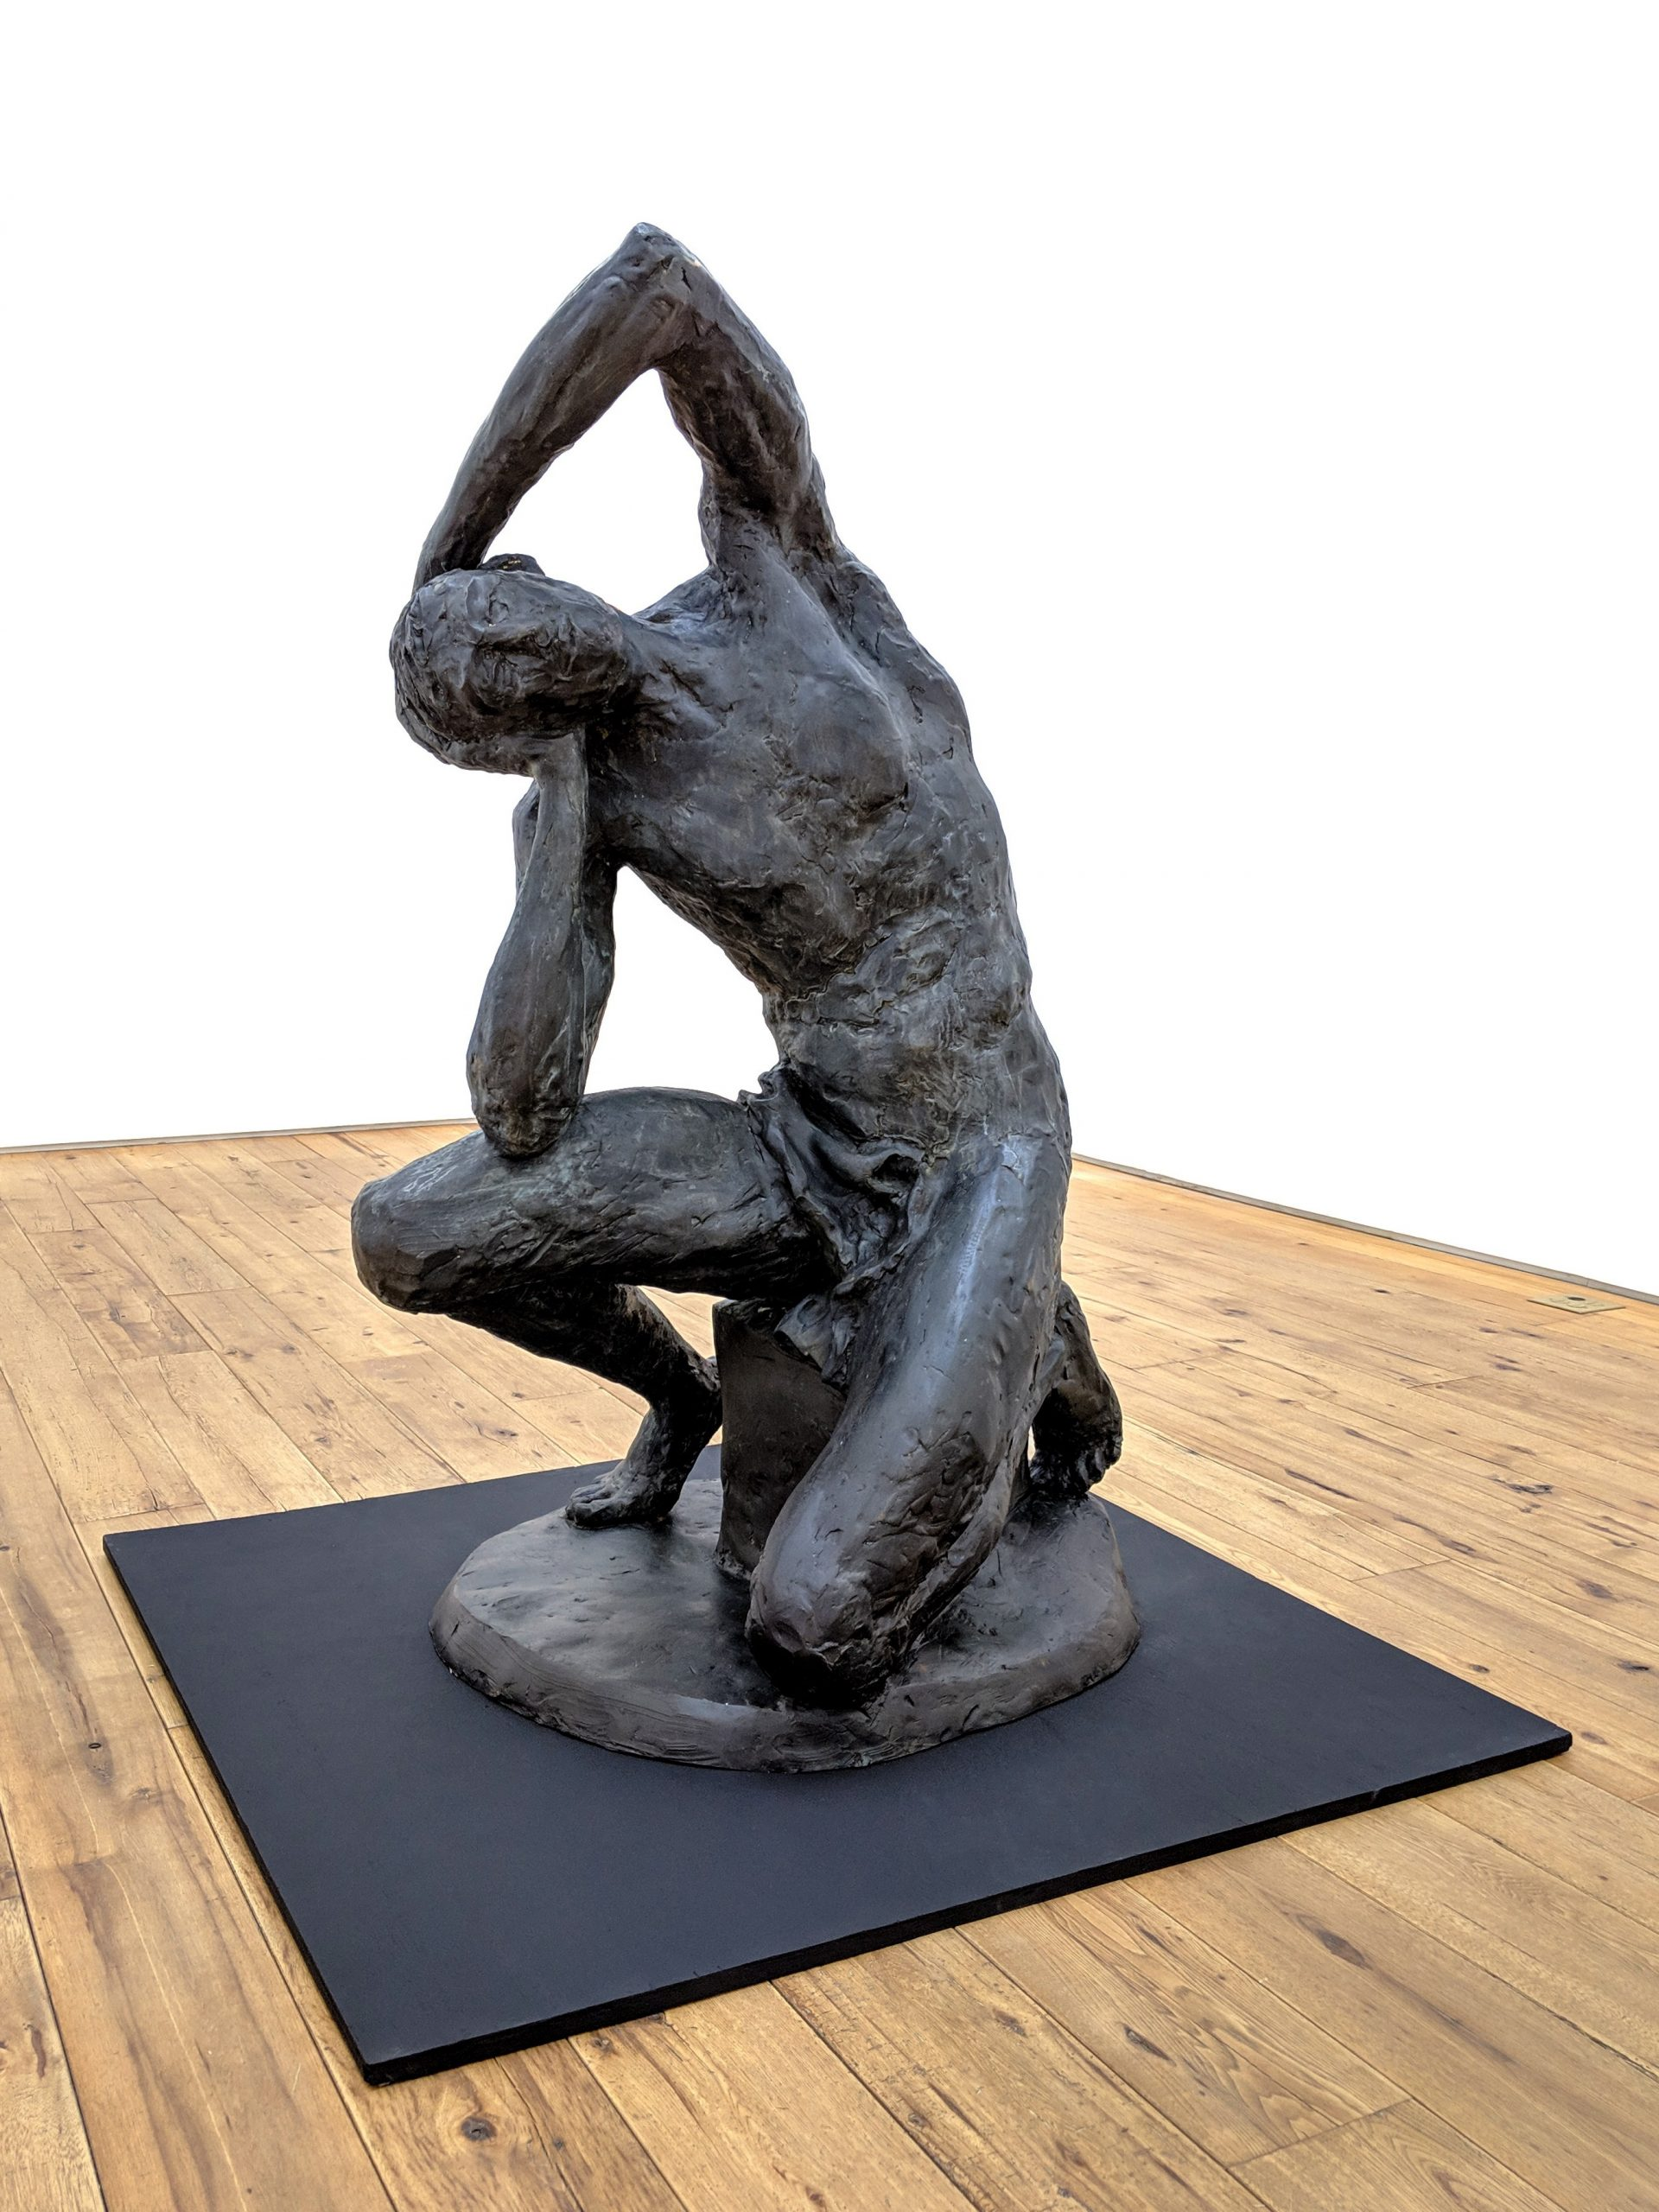 2017 Bronze 57 x 38 x 29 inches (144.8 x 96.5 x 73.7 cm) - Marc Straus Gallery